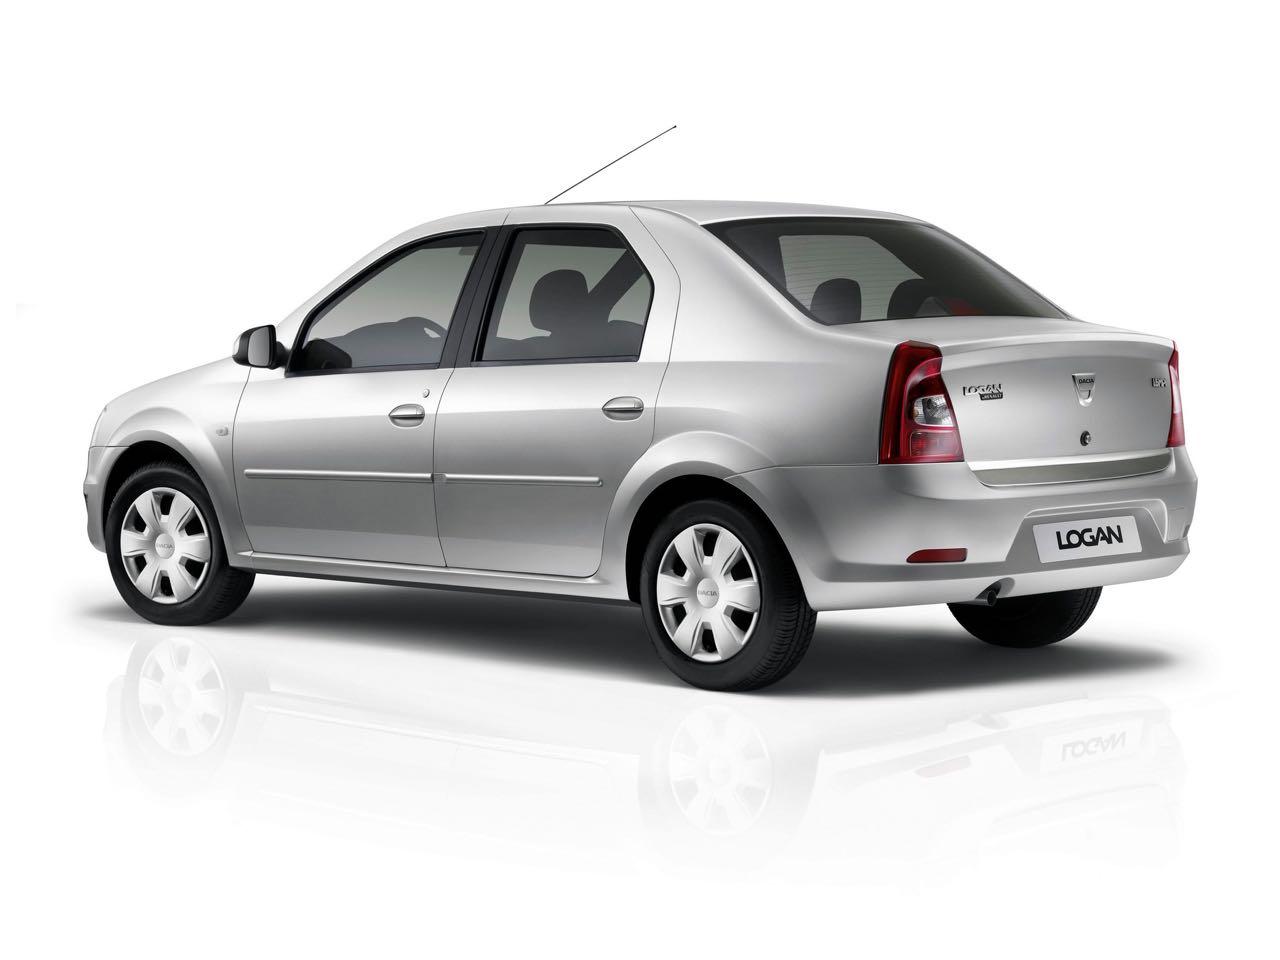 Dacia Logan 2009 zaga